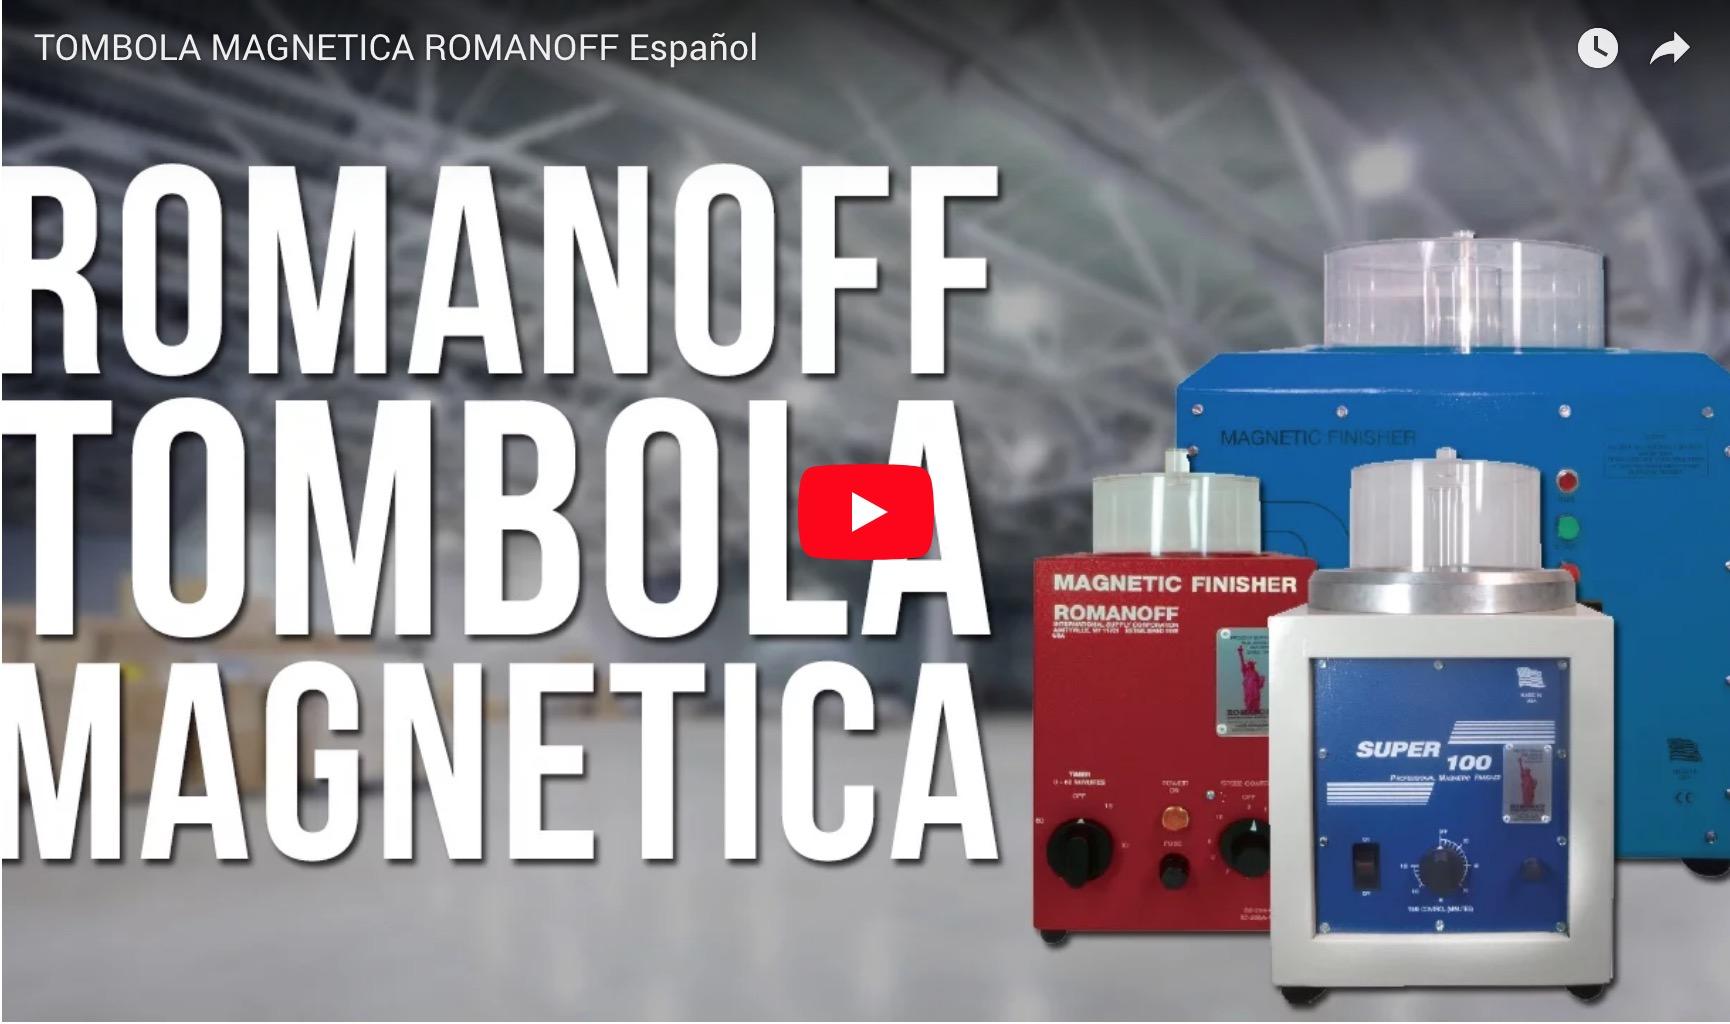 TOMBOLA MAGNETICA ROMANOFF Español